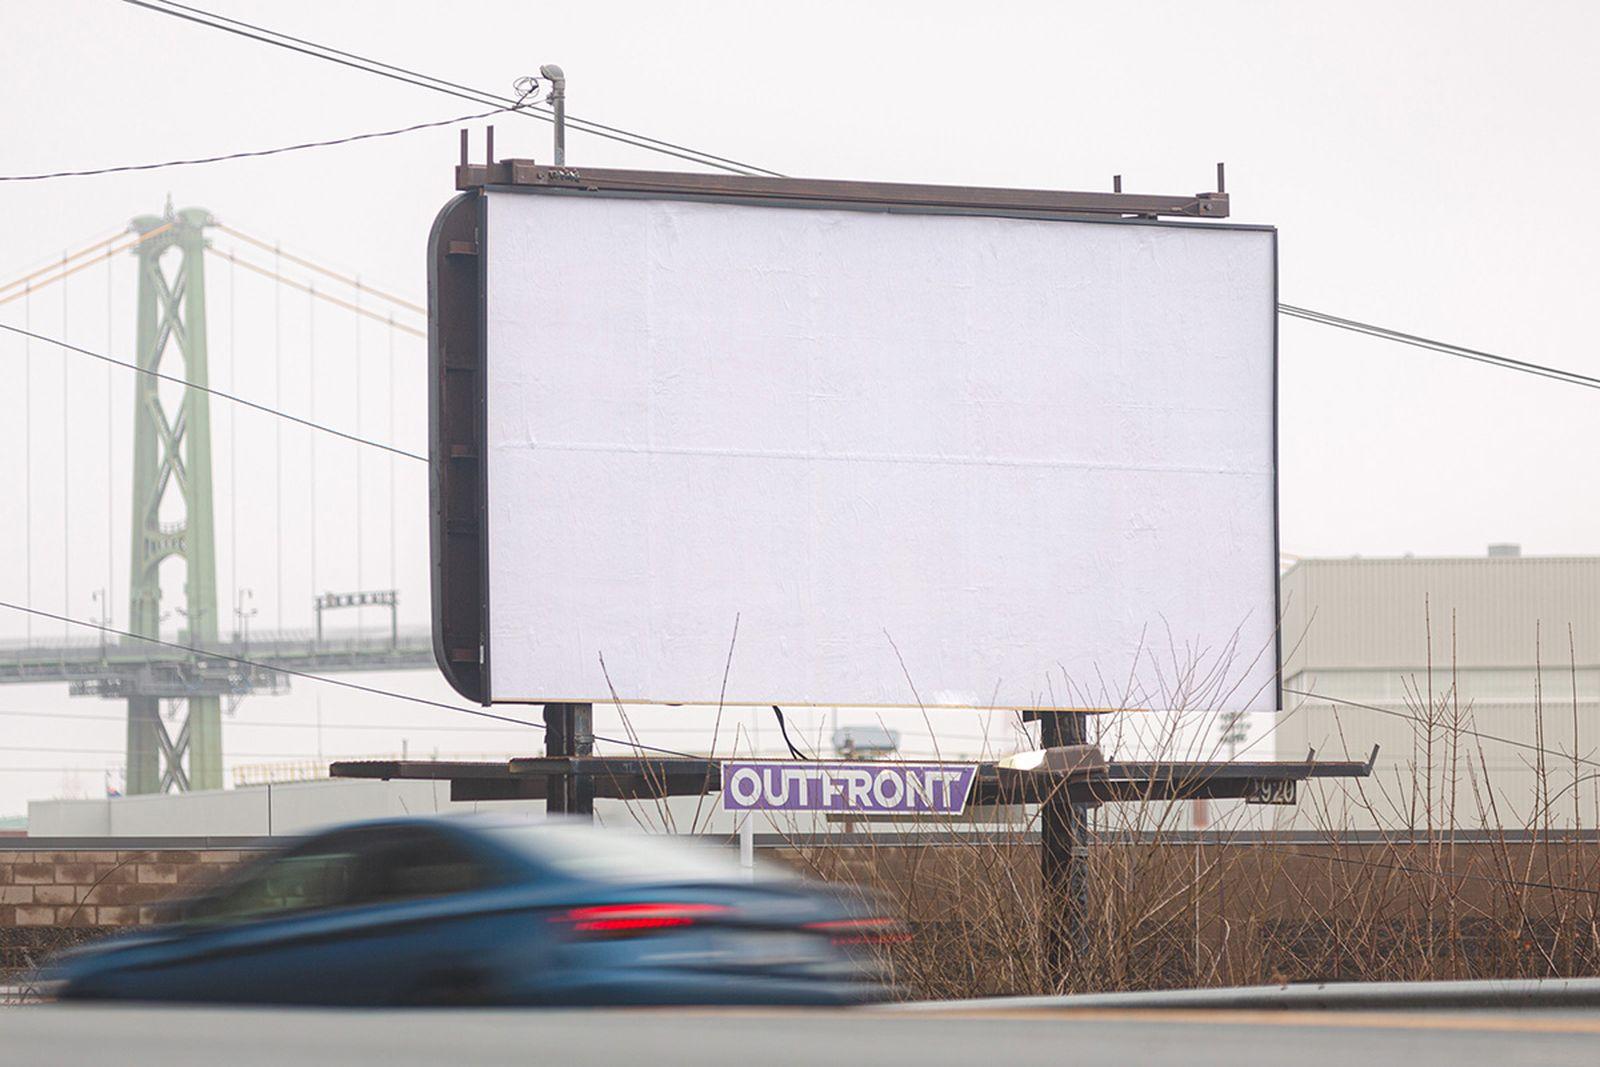 Wunder's blank ad in Halifax, Nova Scotia